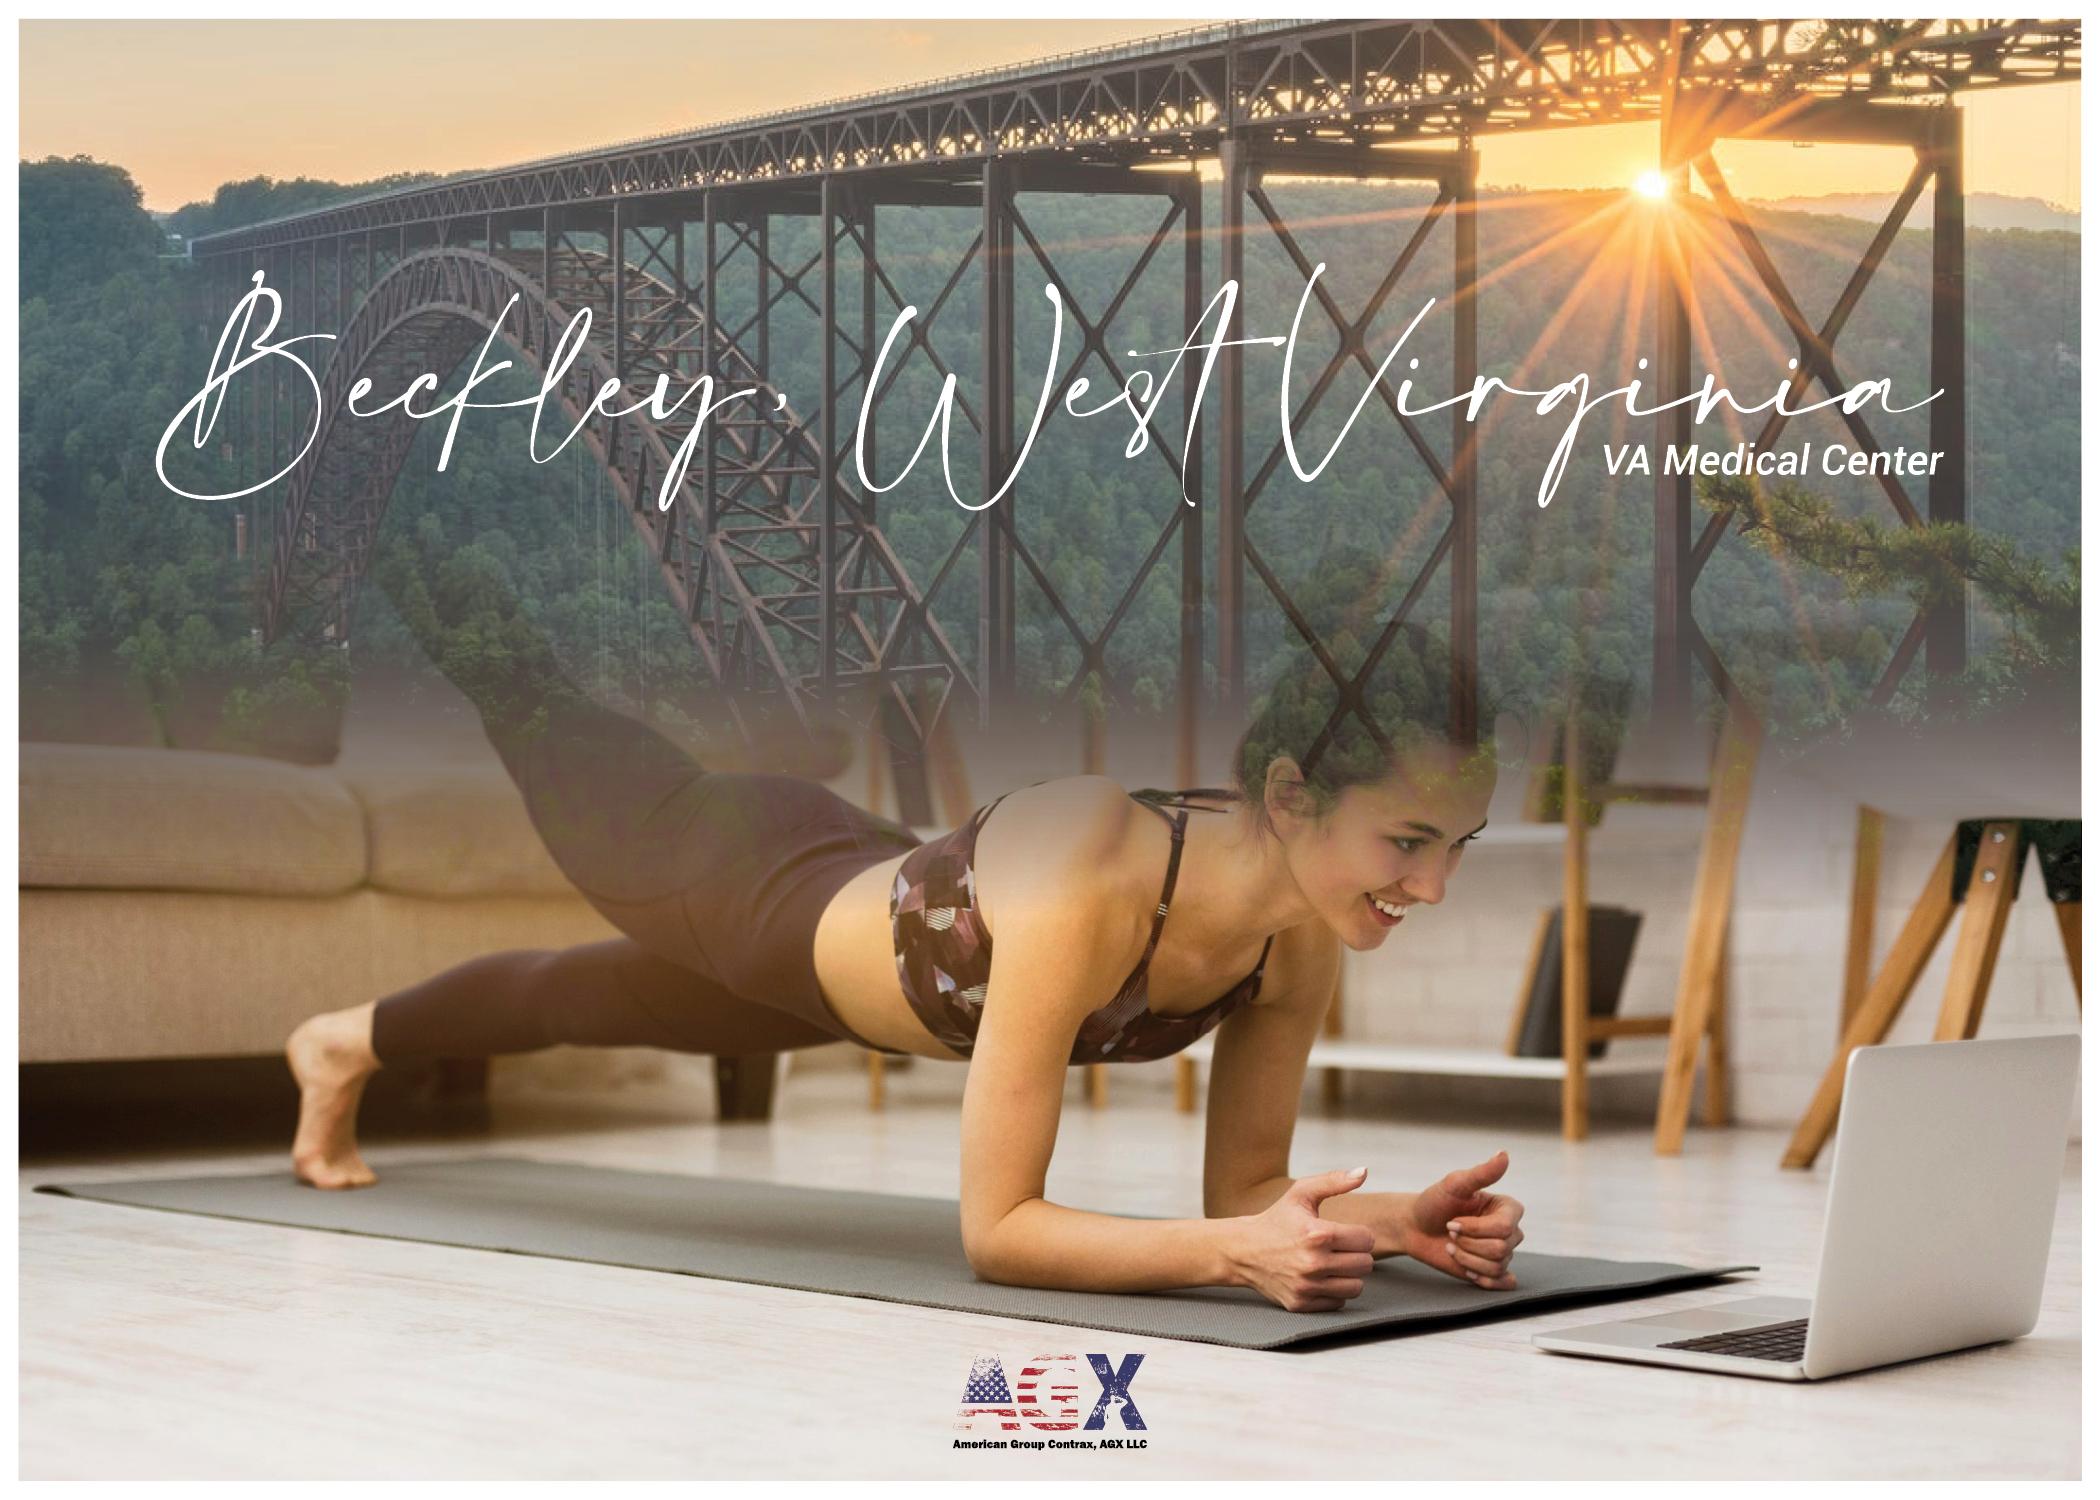 AGX WHOLE HEALTH UNIVERSITY